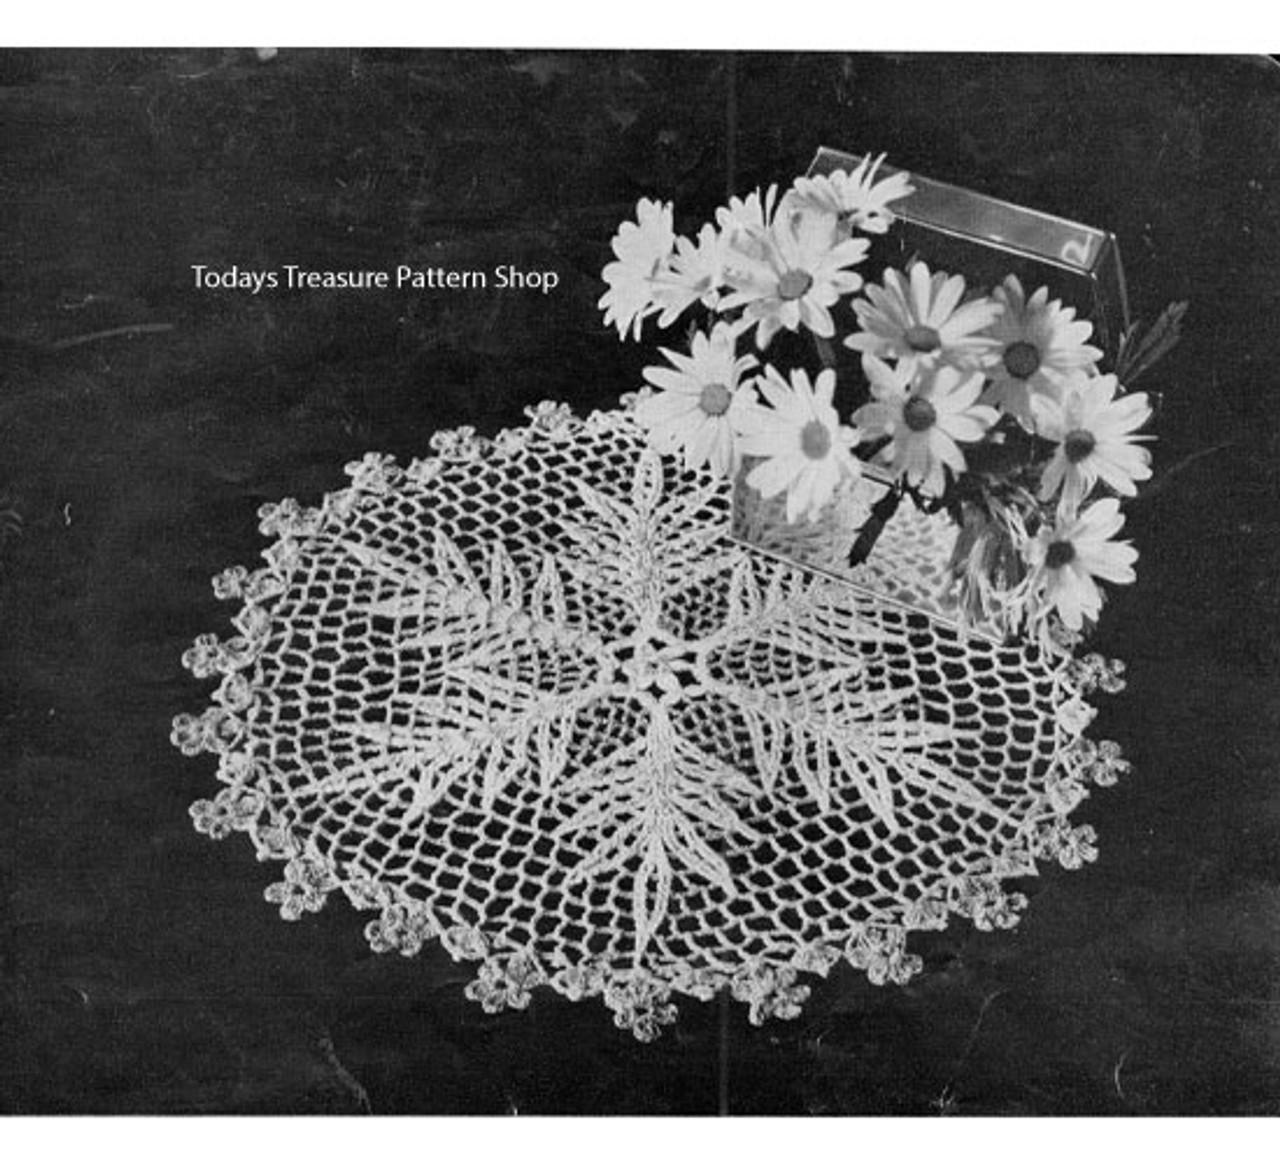 Crocheted Pinky Doily Pattern, Vintage 1950s